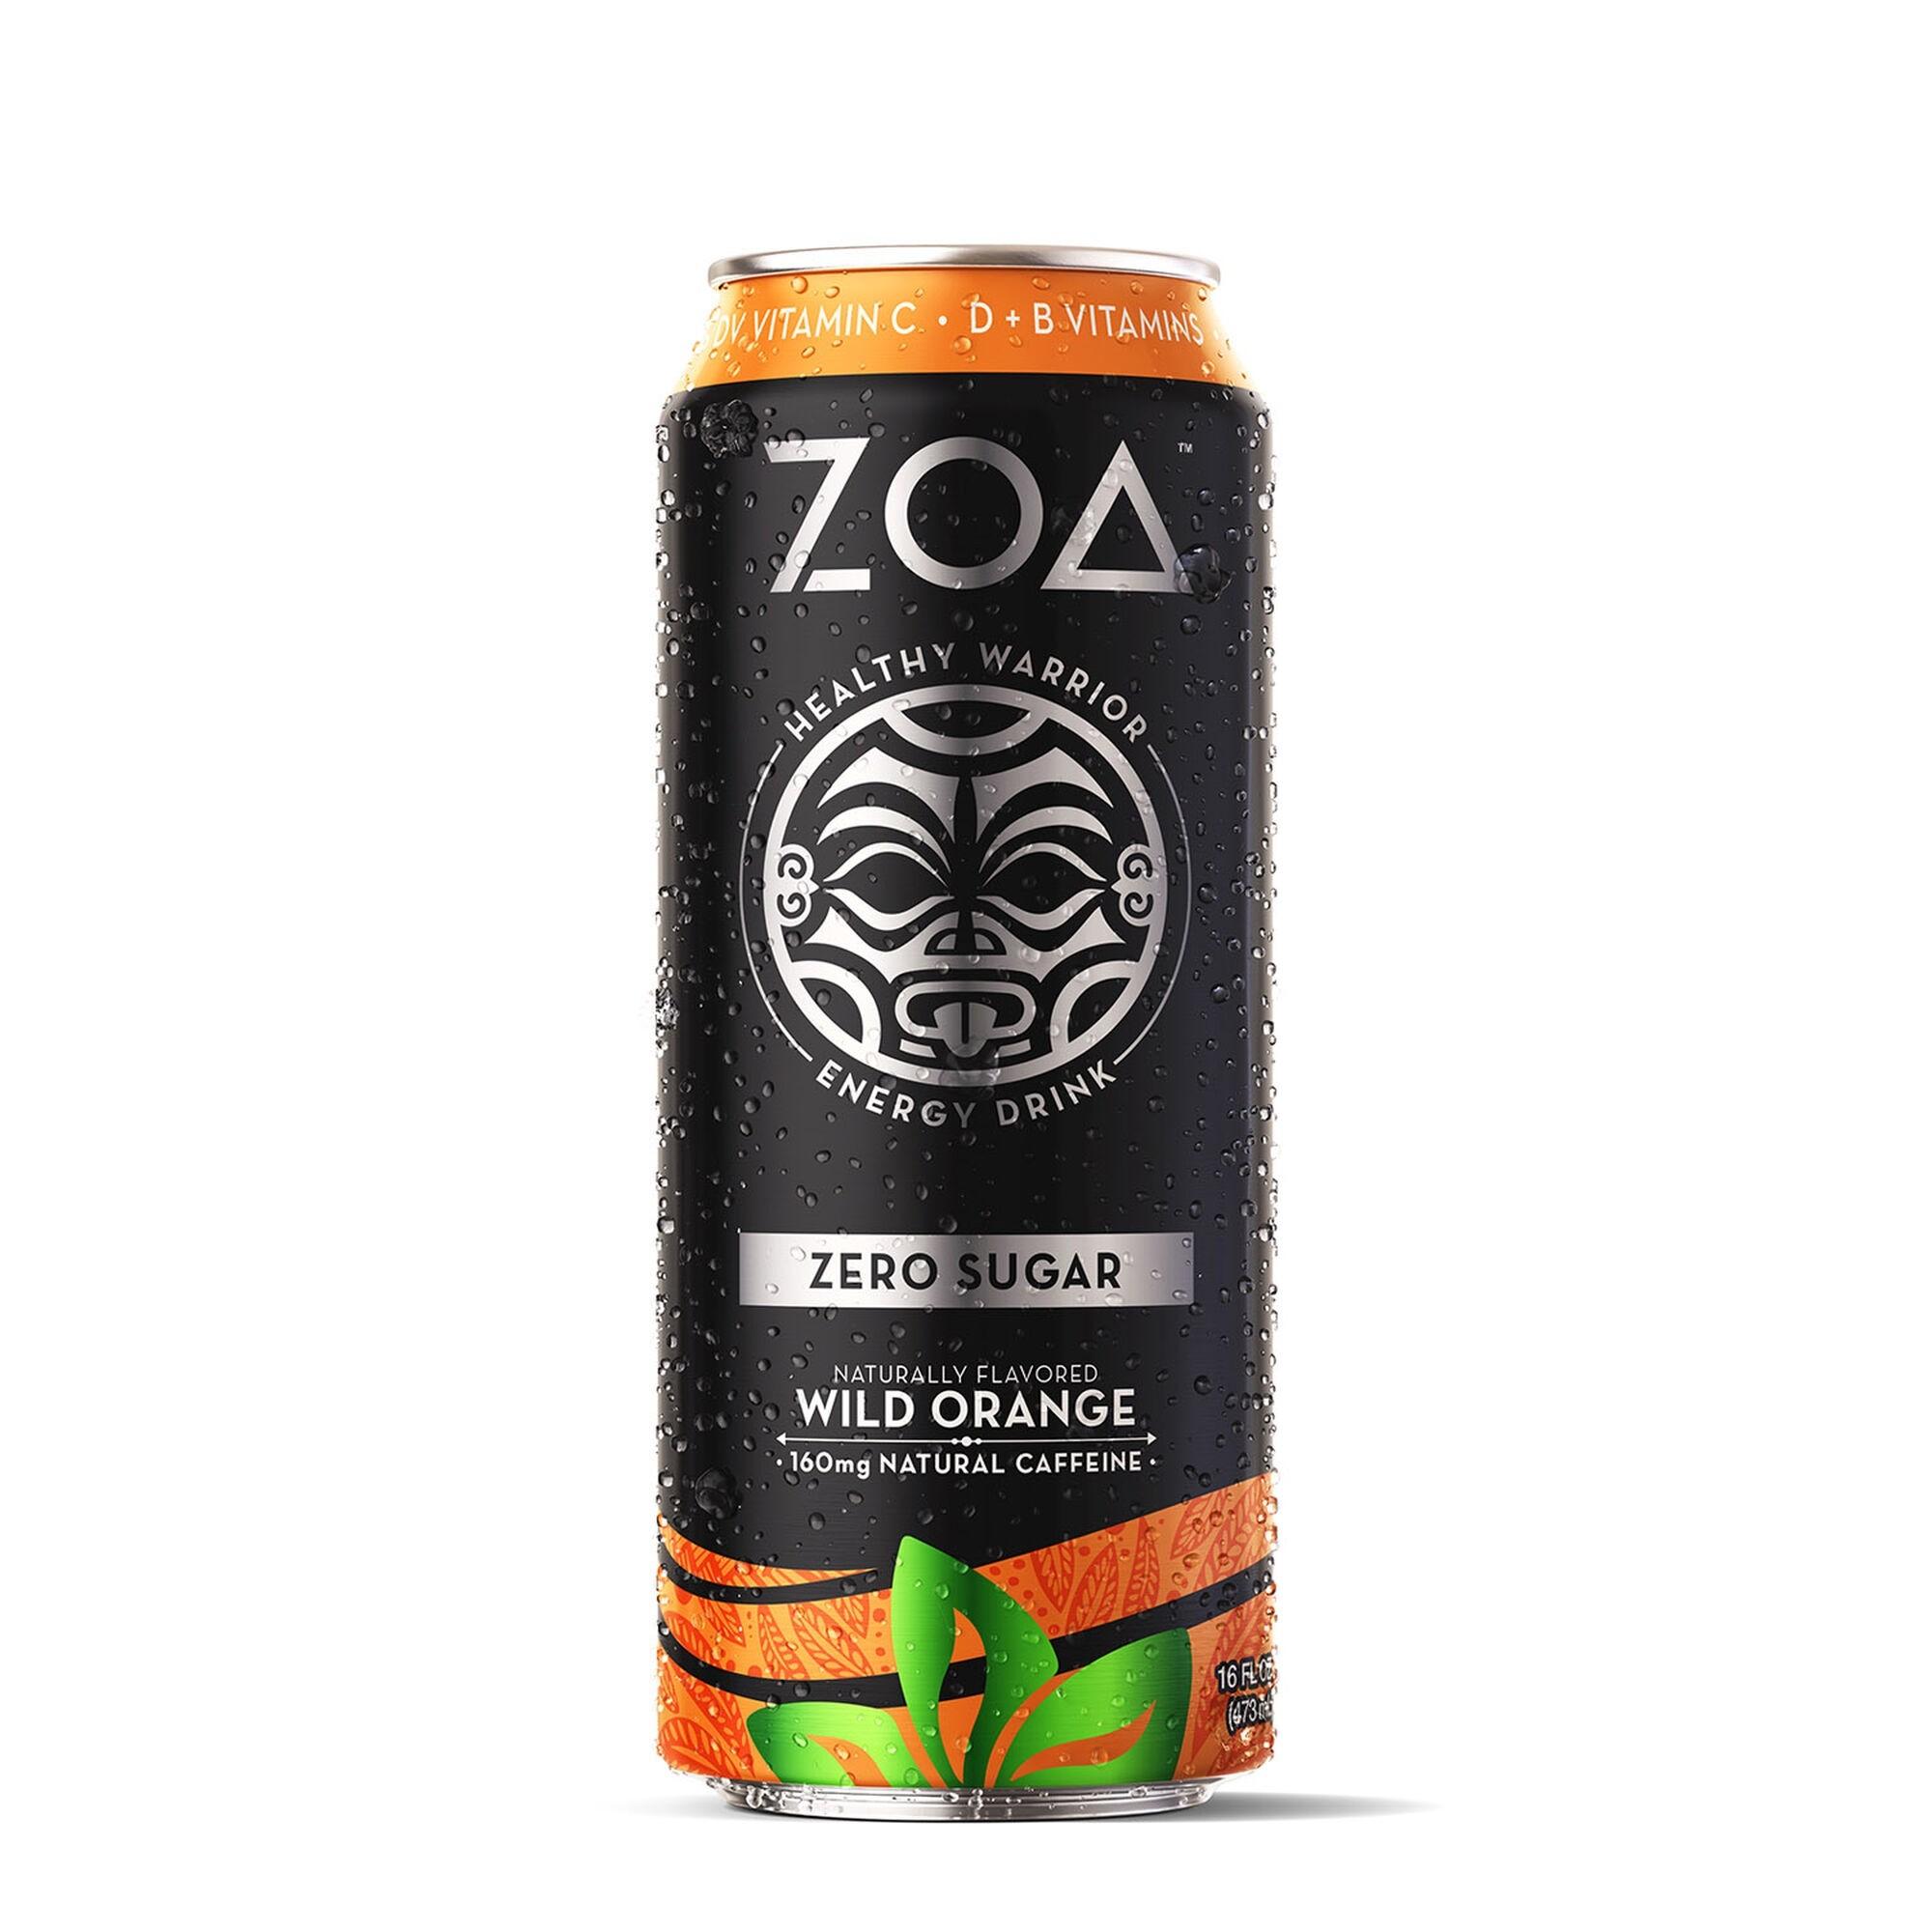 ZOA™ Energy Drink Zero Sugar Bautura Energizanta 0 Zahar cu Aroma de Portocale Salbatice, 473ml